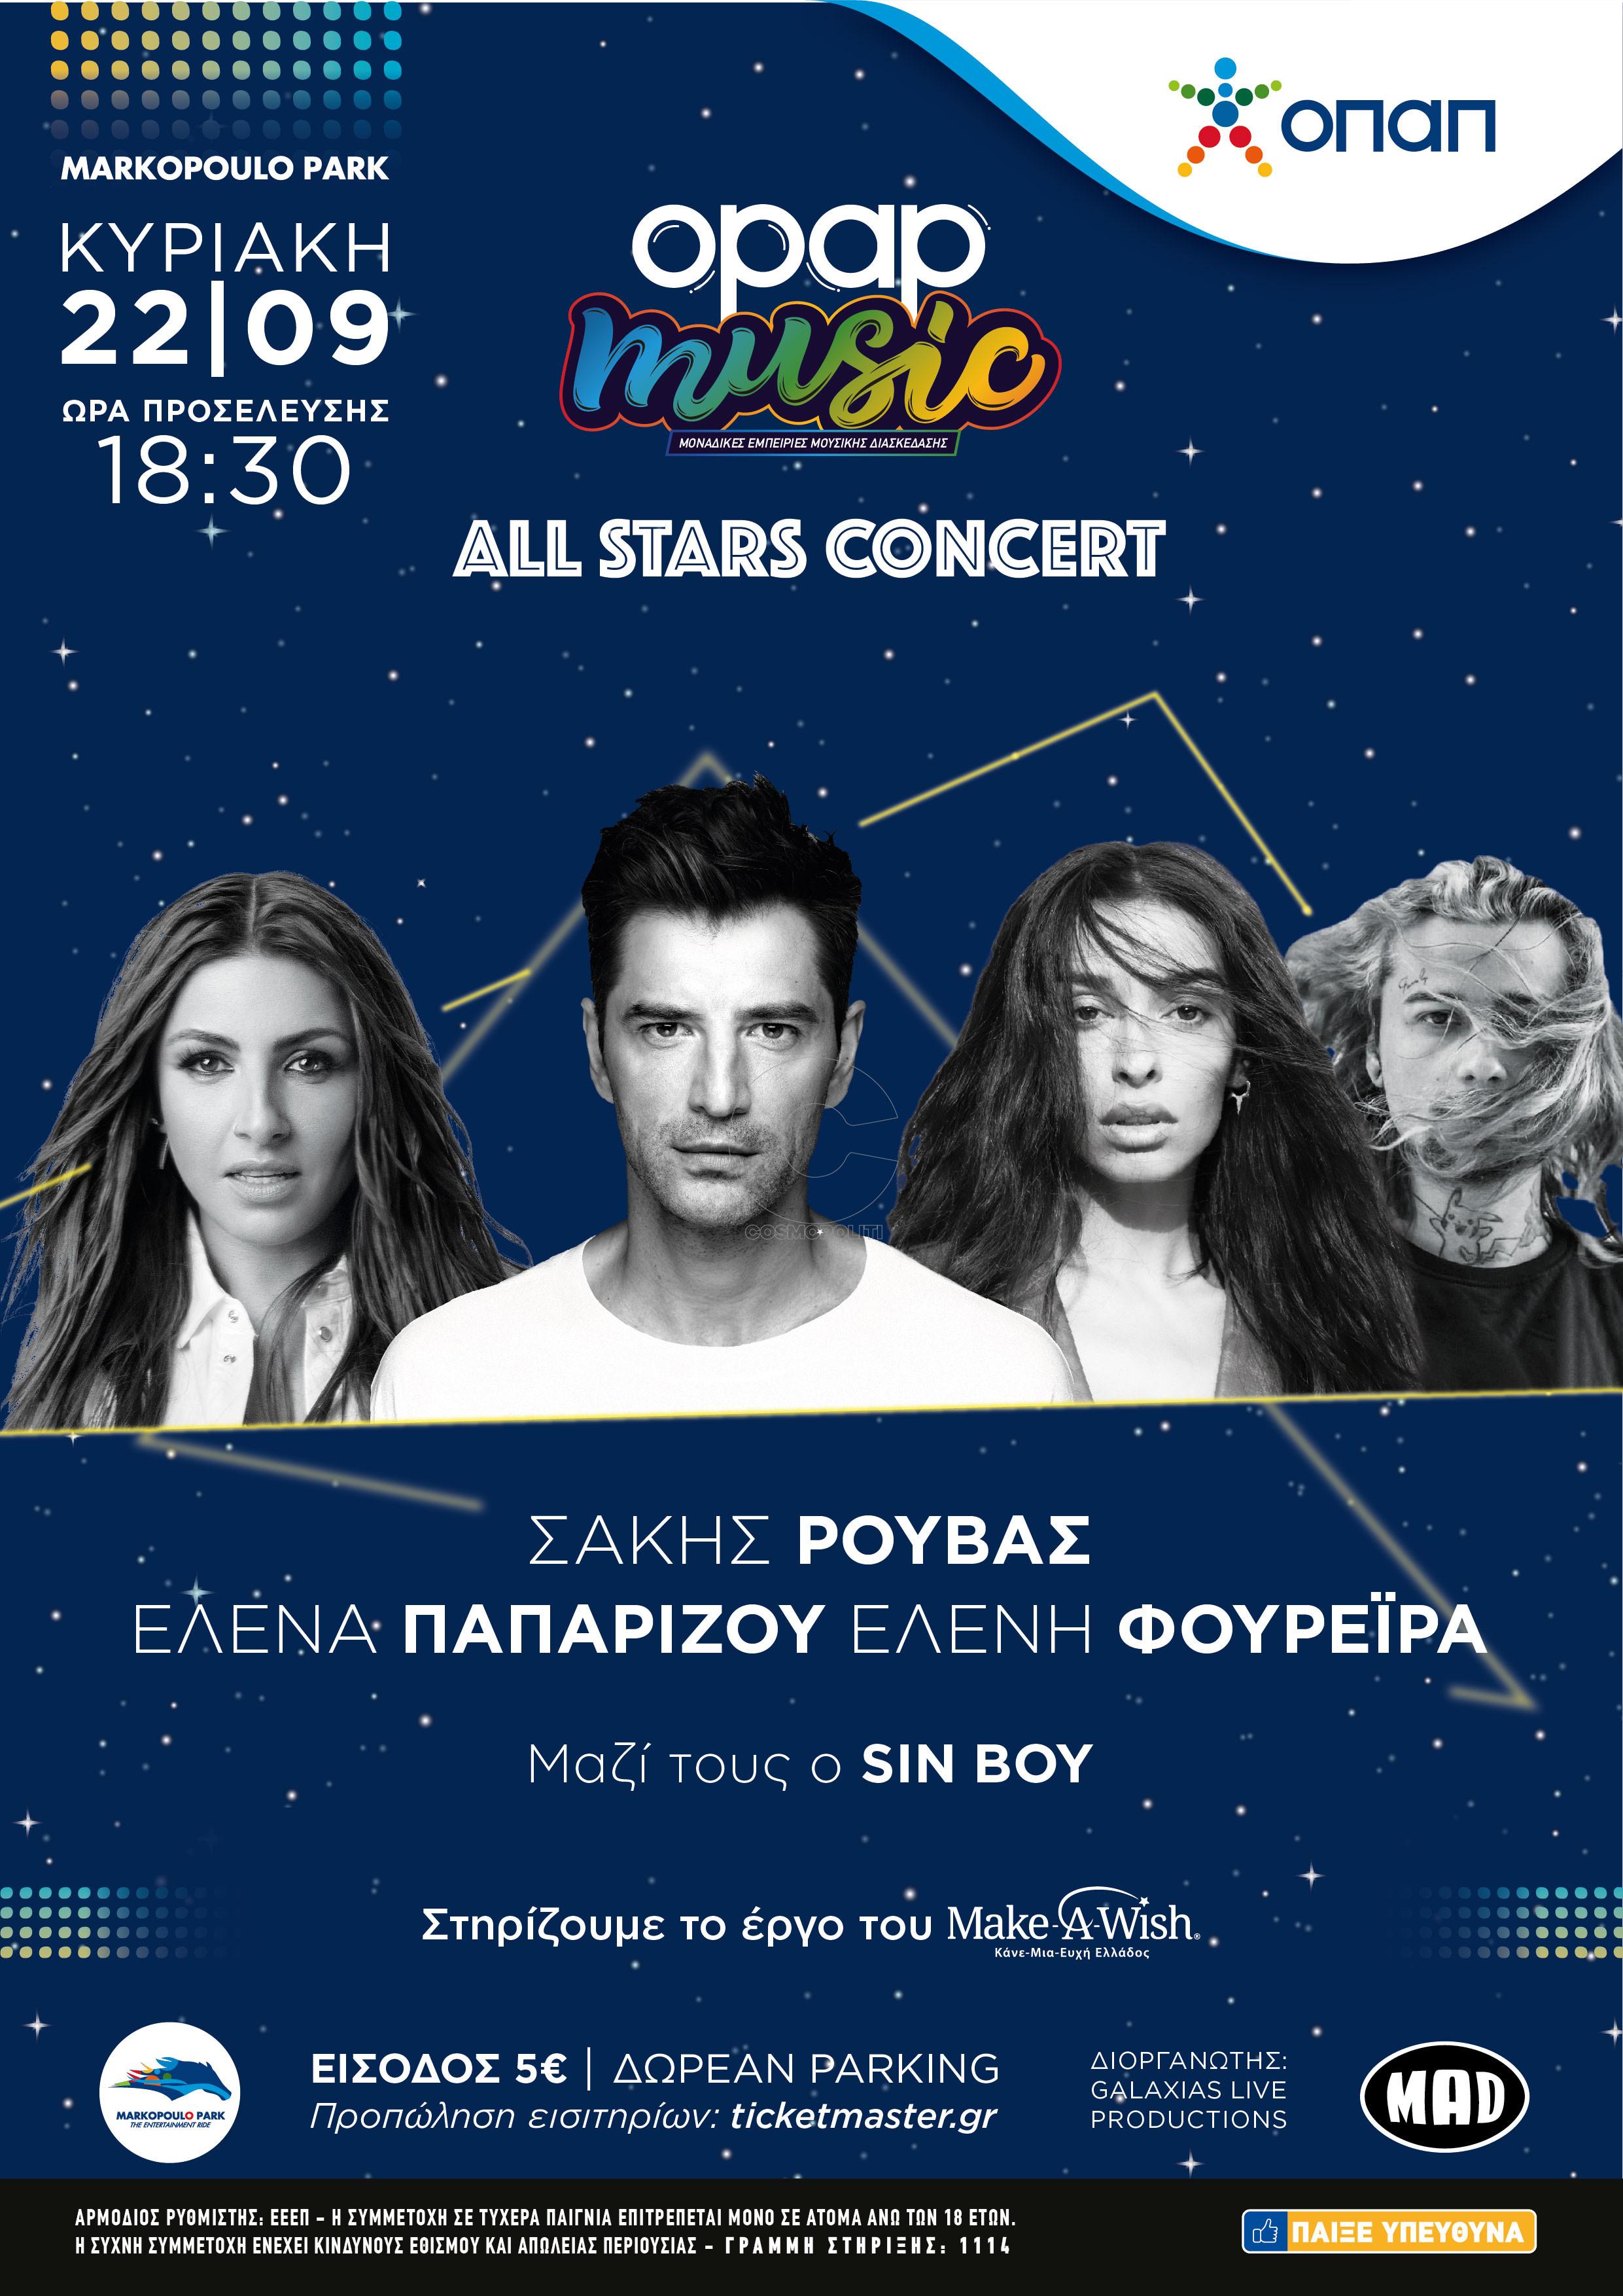 All stars concert